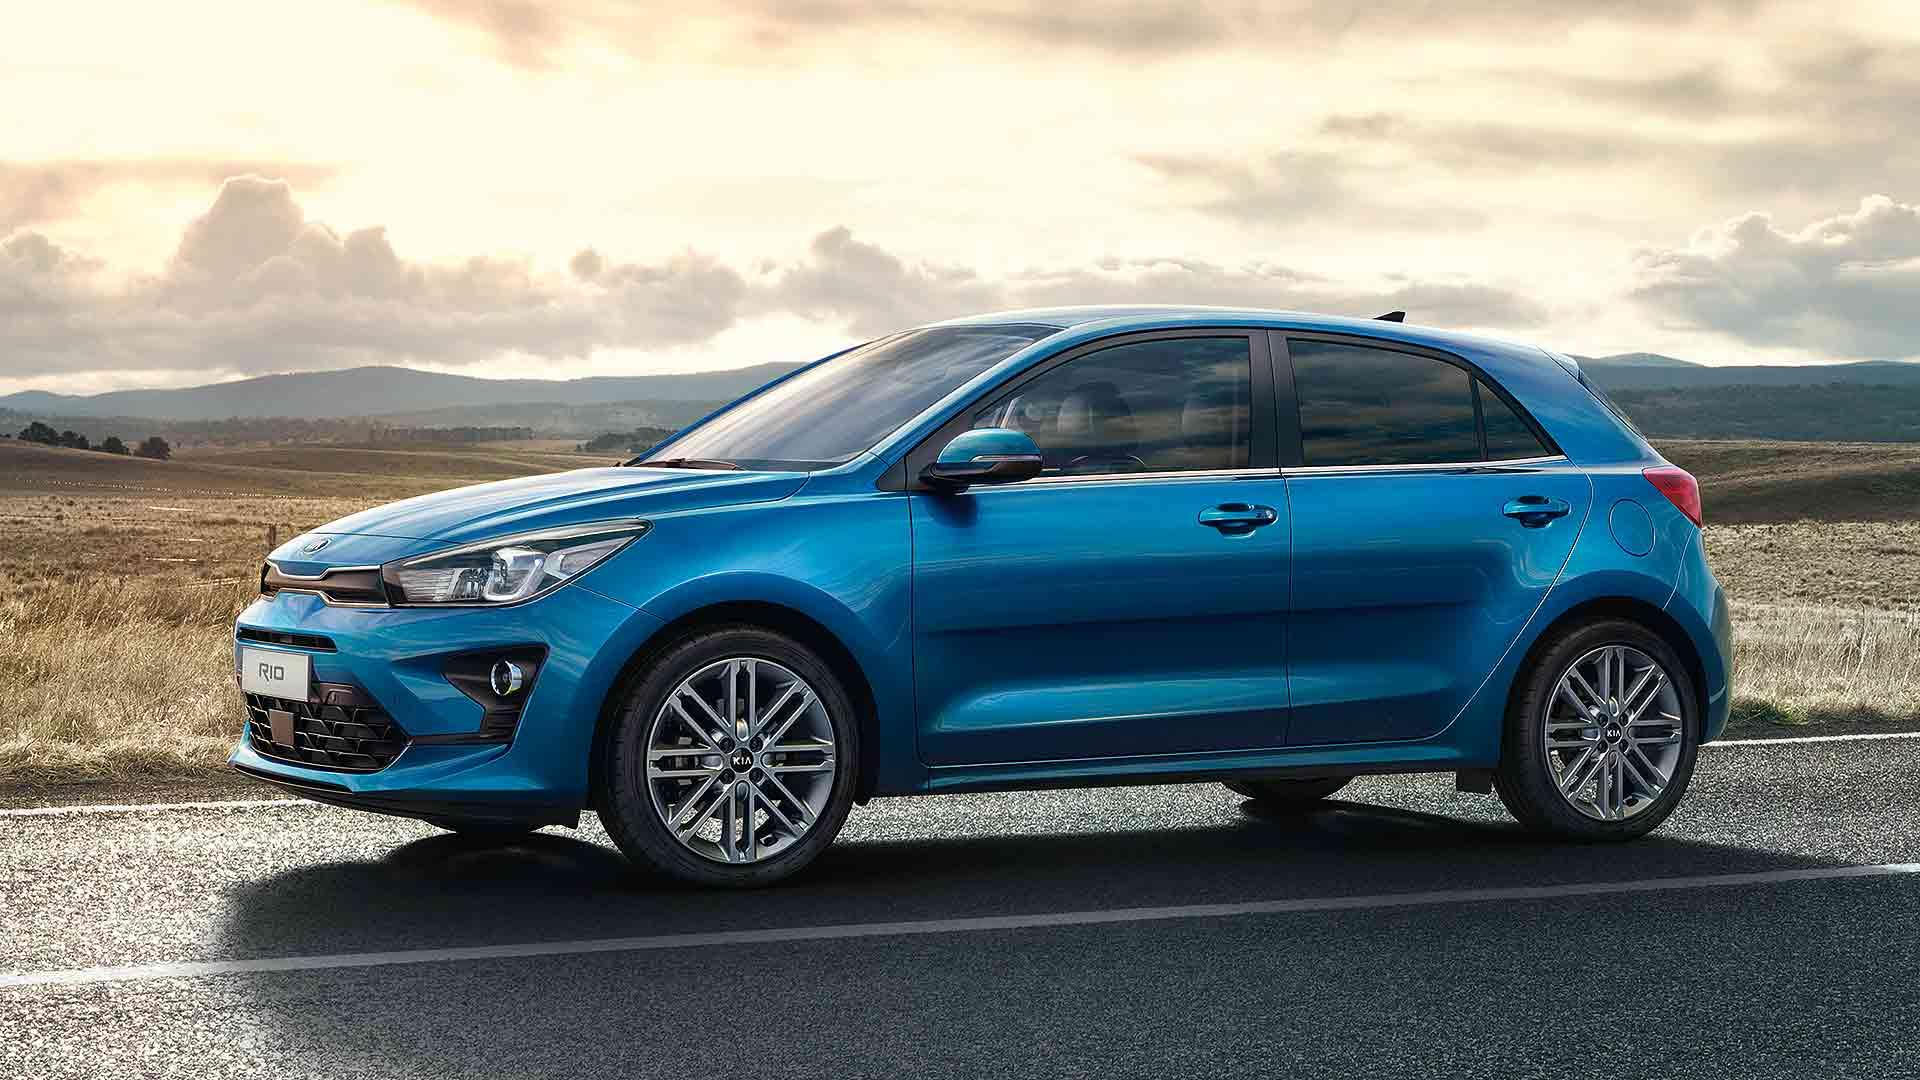 2020 Kia Rio facelift front